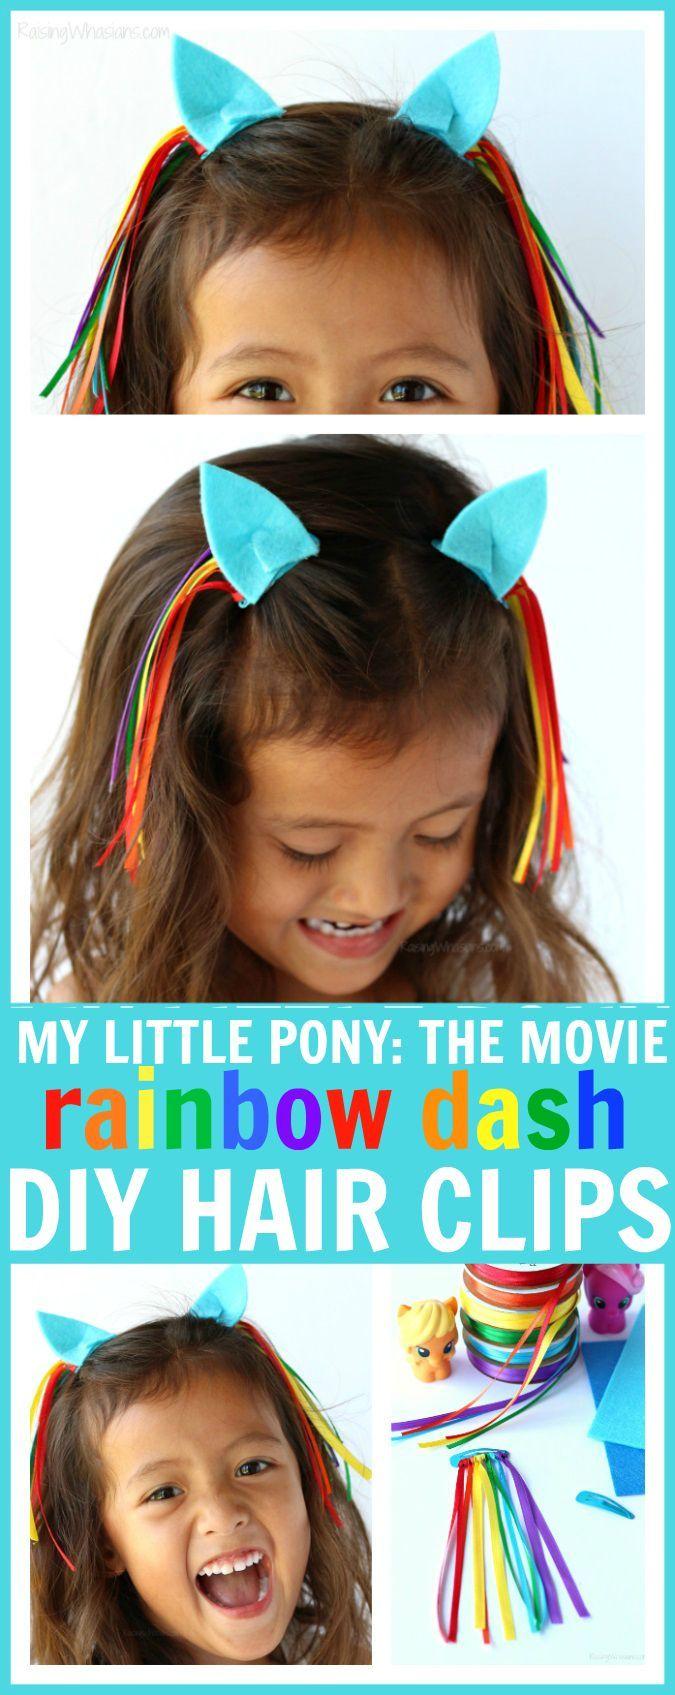 DIY My Little Pony Hair Clips to Celebrate My Little Pony: The Movie - Raising Whasians via @raisingwhasians